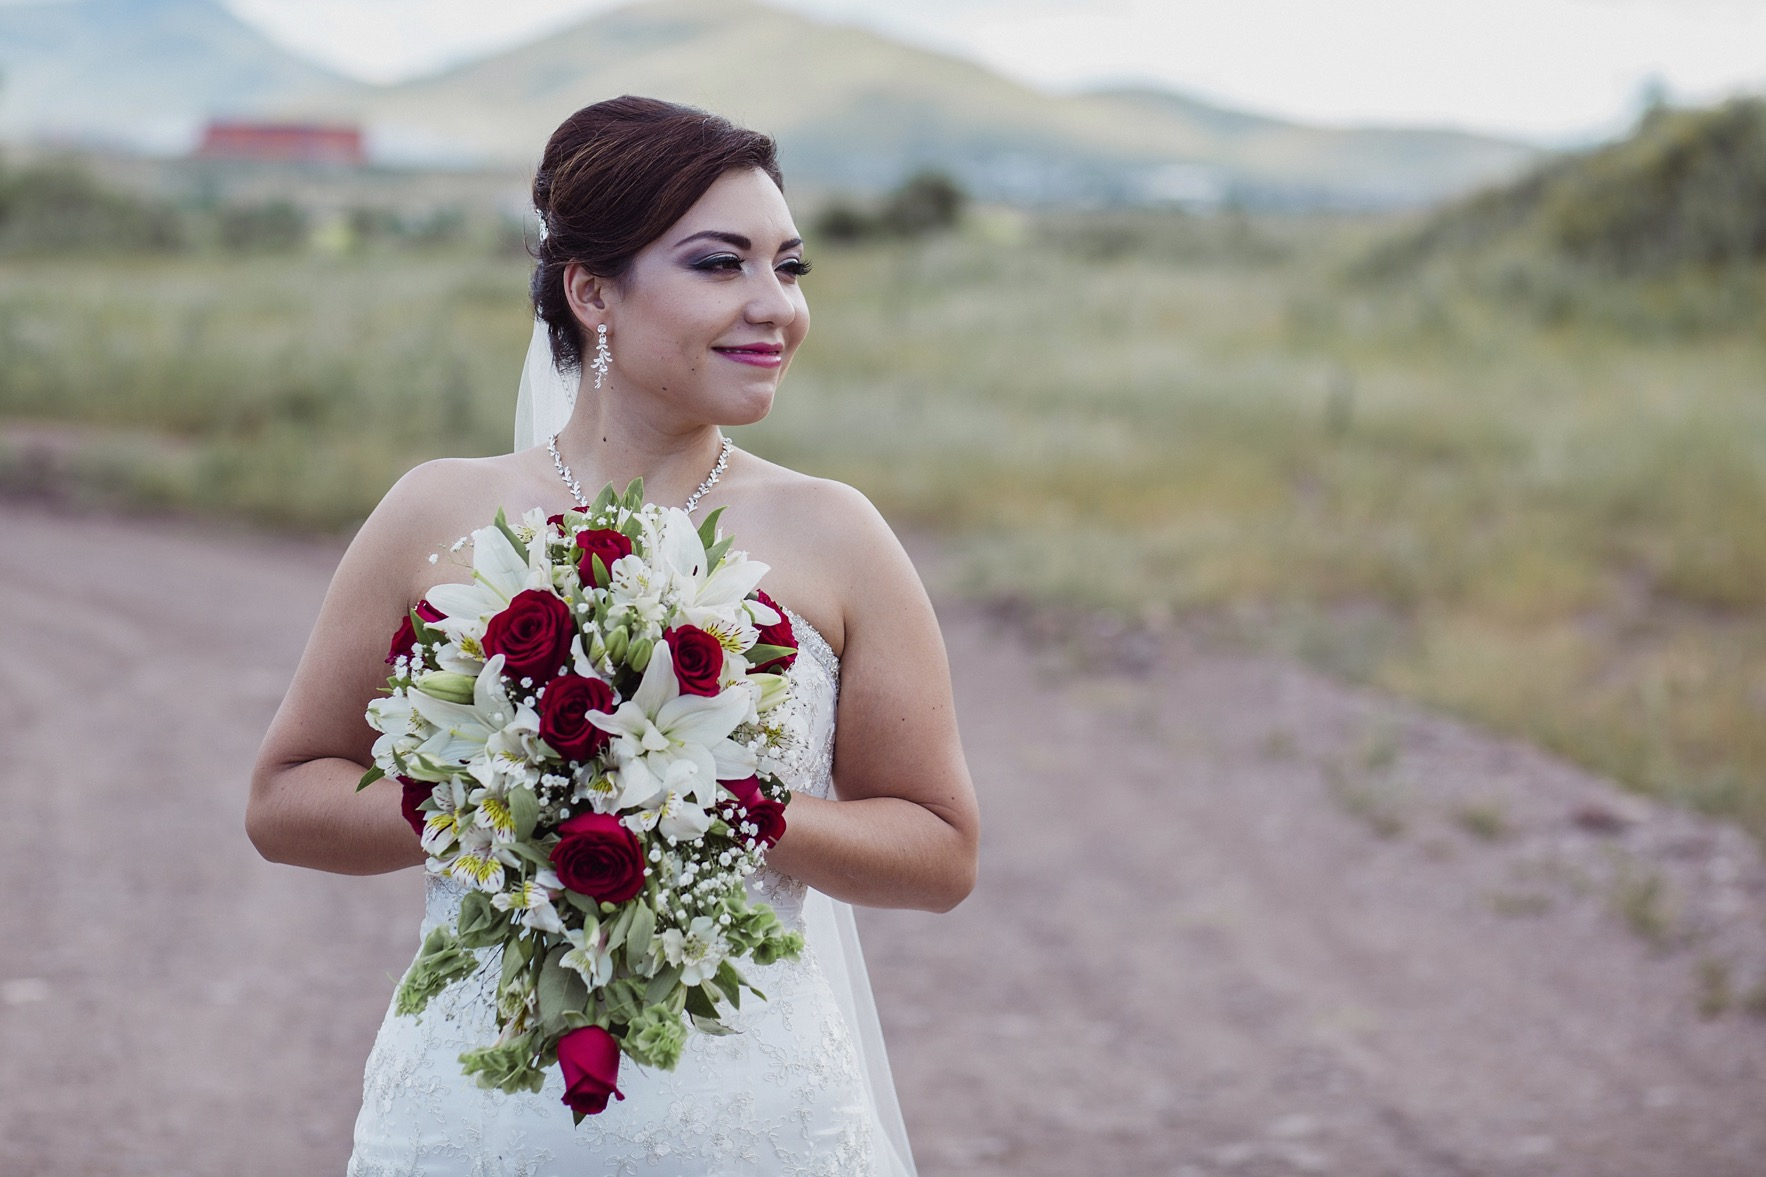 fotografo_profesional_bodas_xv_chihuahua_zacatecas_mexico-28